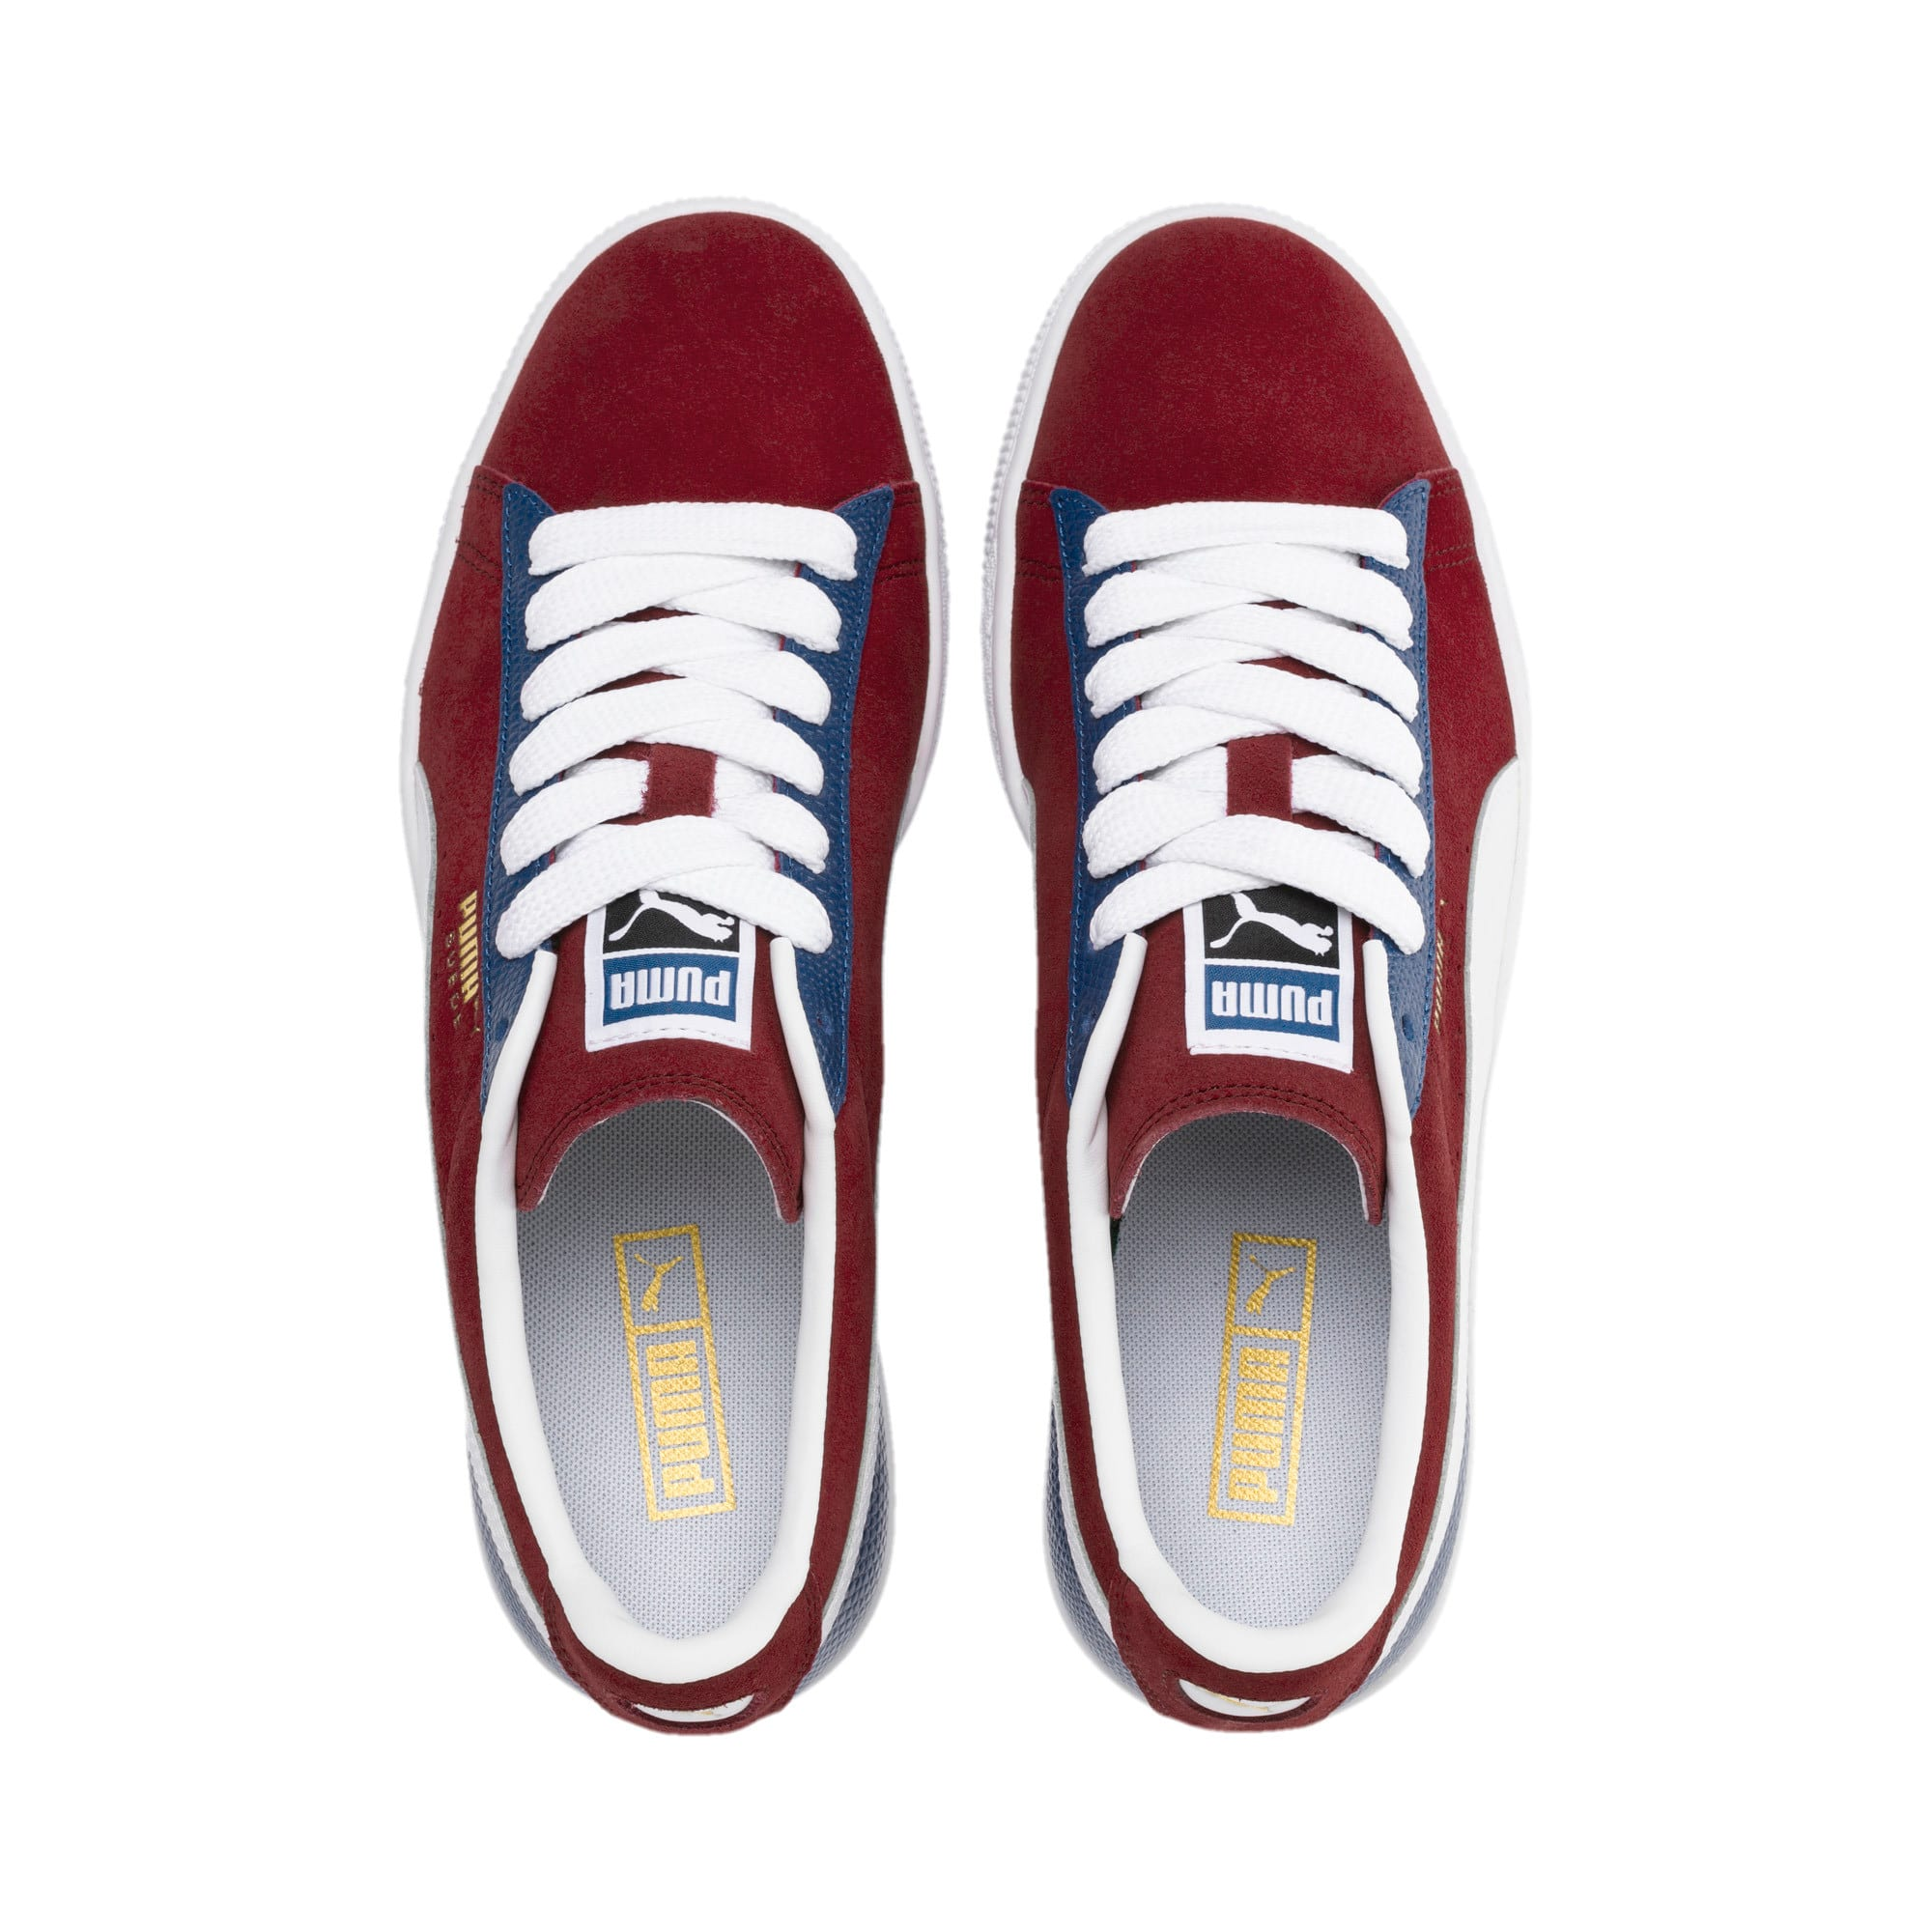 Thumbnail 7 of Suede Classic Block Sneakers, Rhubarb- Blue-White, medium